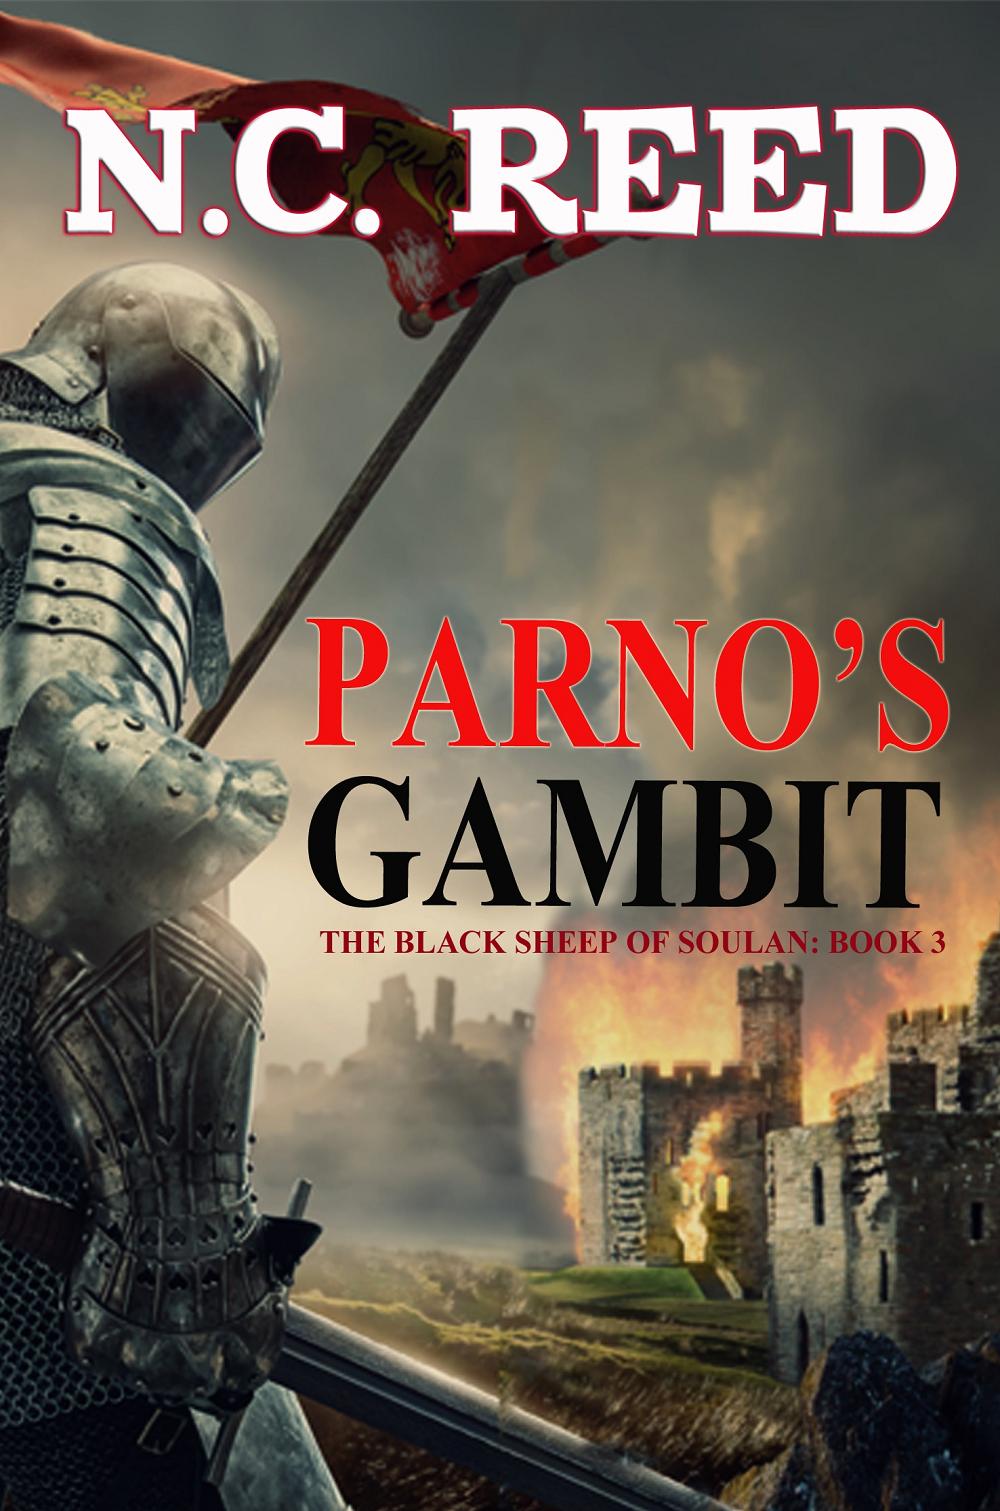 """The Black Sheep of Soulan: Book 3: Parno's Gambit"""